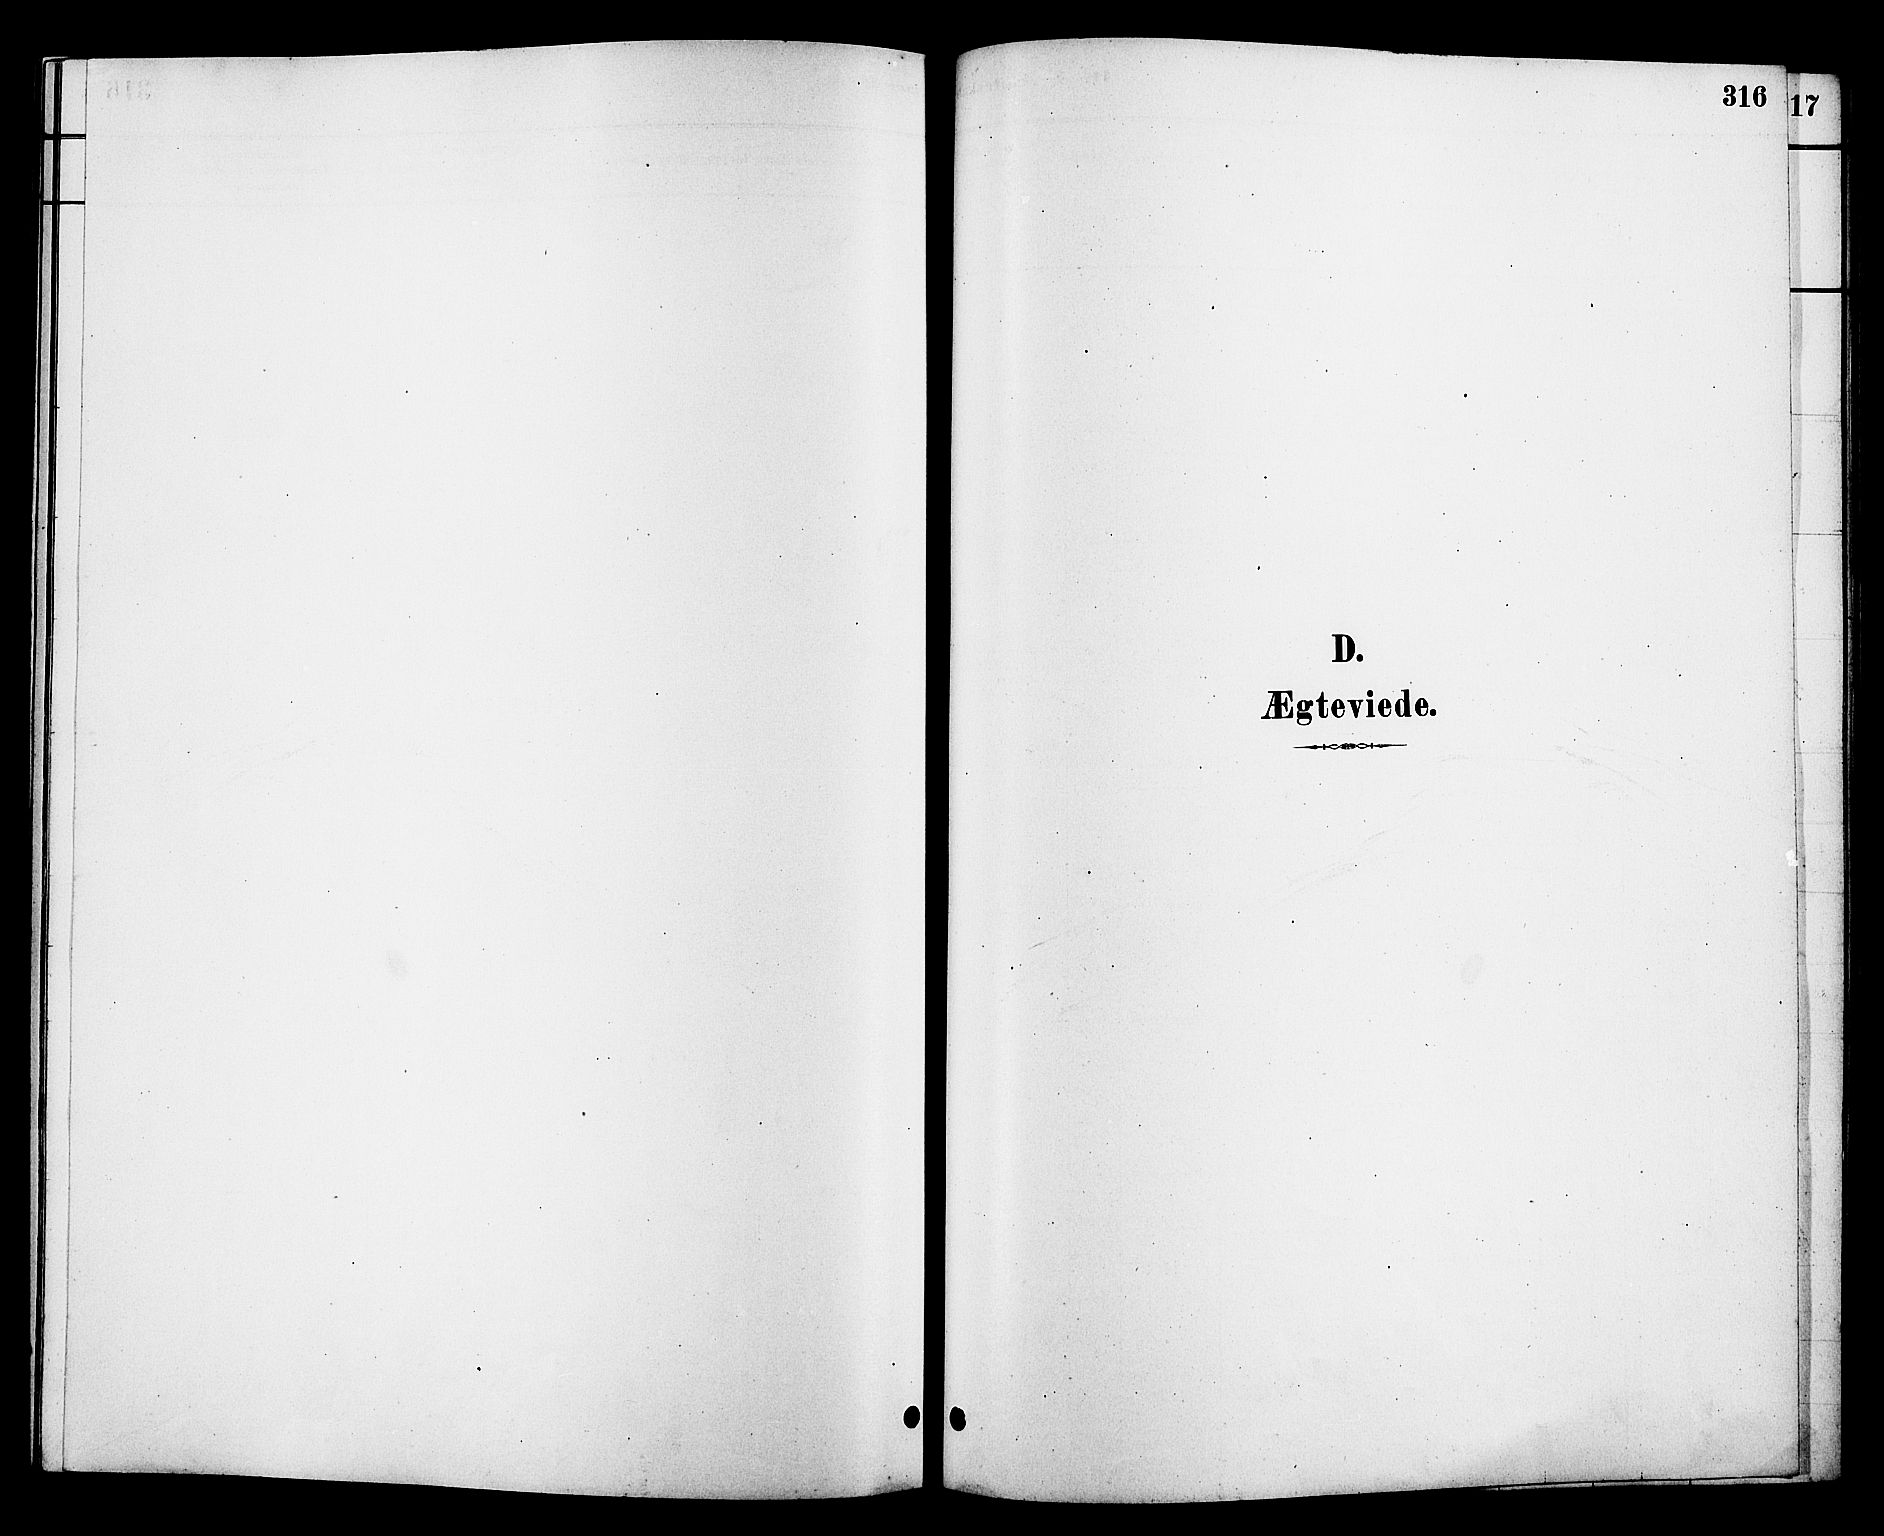 SAKO, Heddal kirkebøker, G/Ga/L0002: Klokkerbok nr. I 2, 1879-1908, s. 316